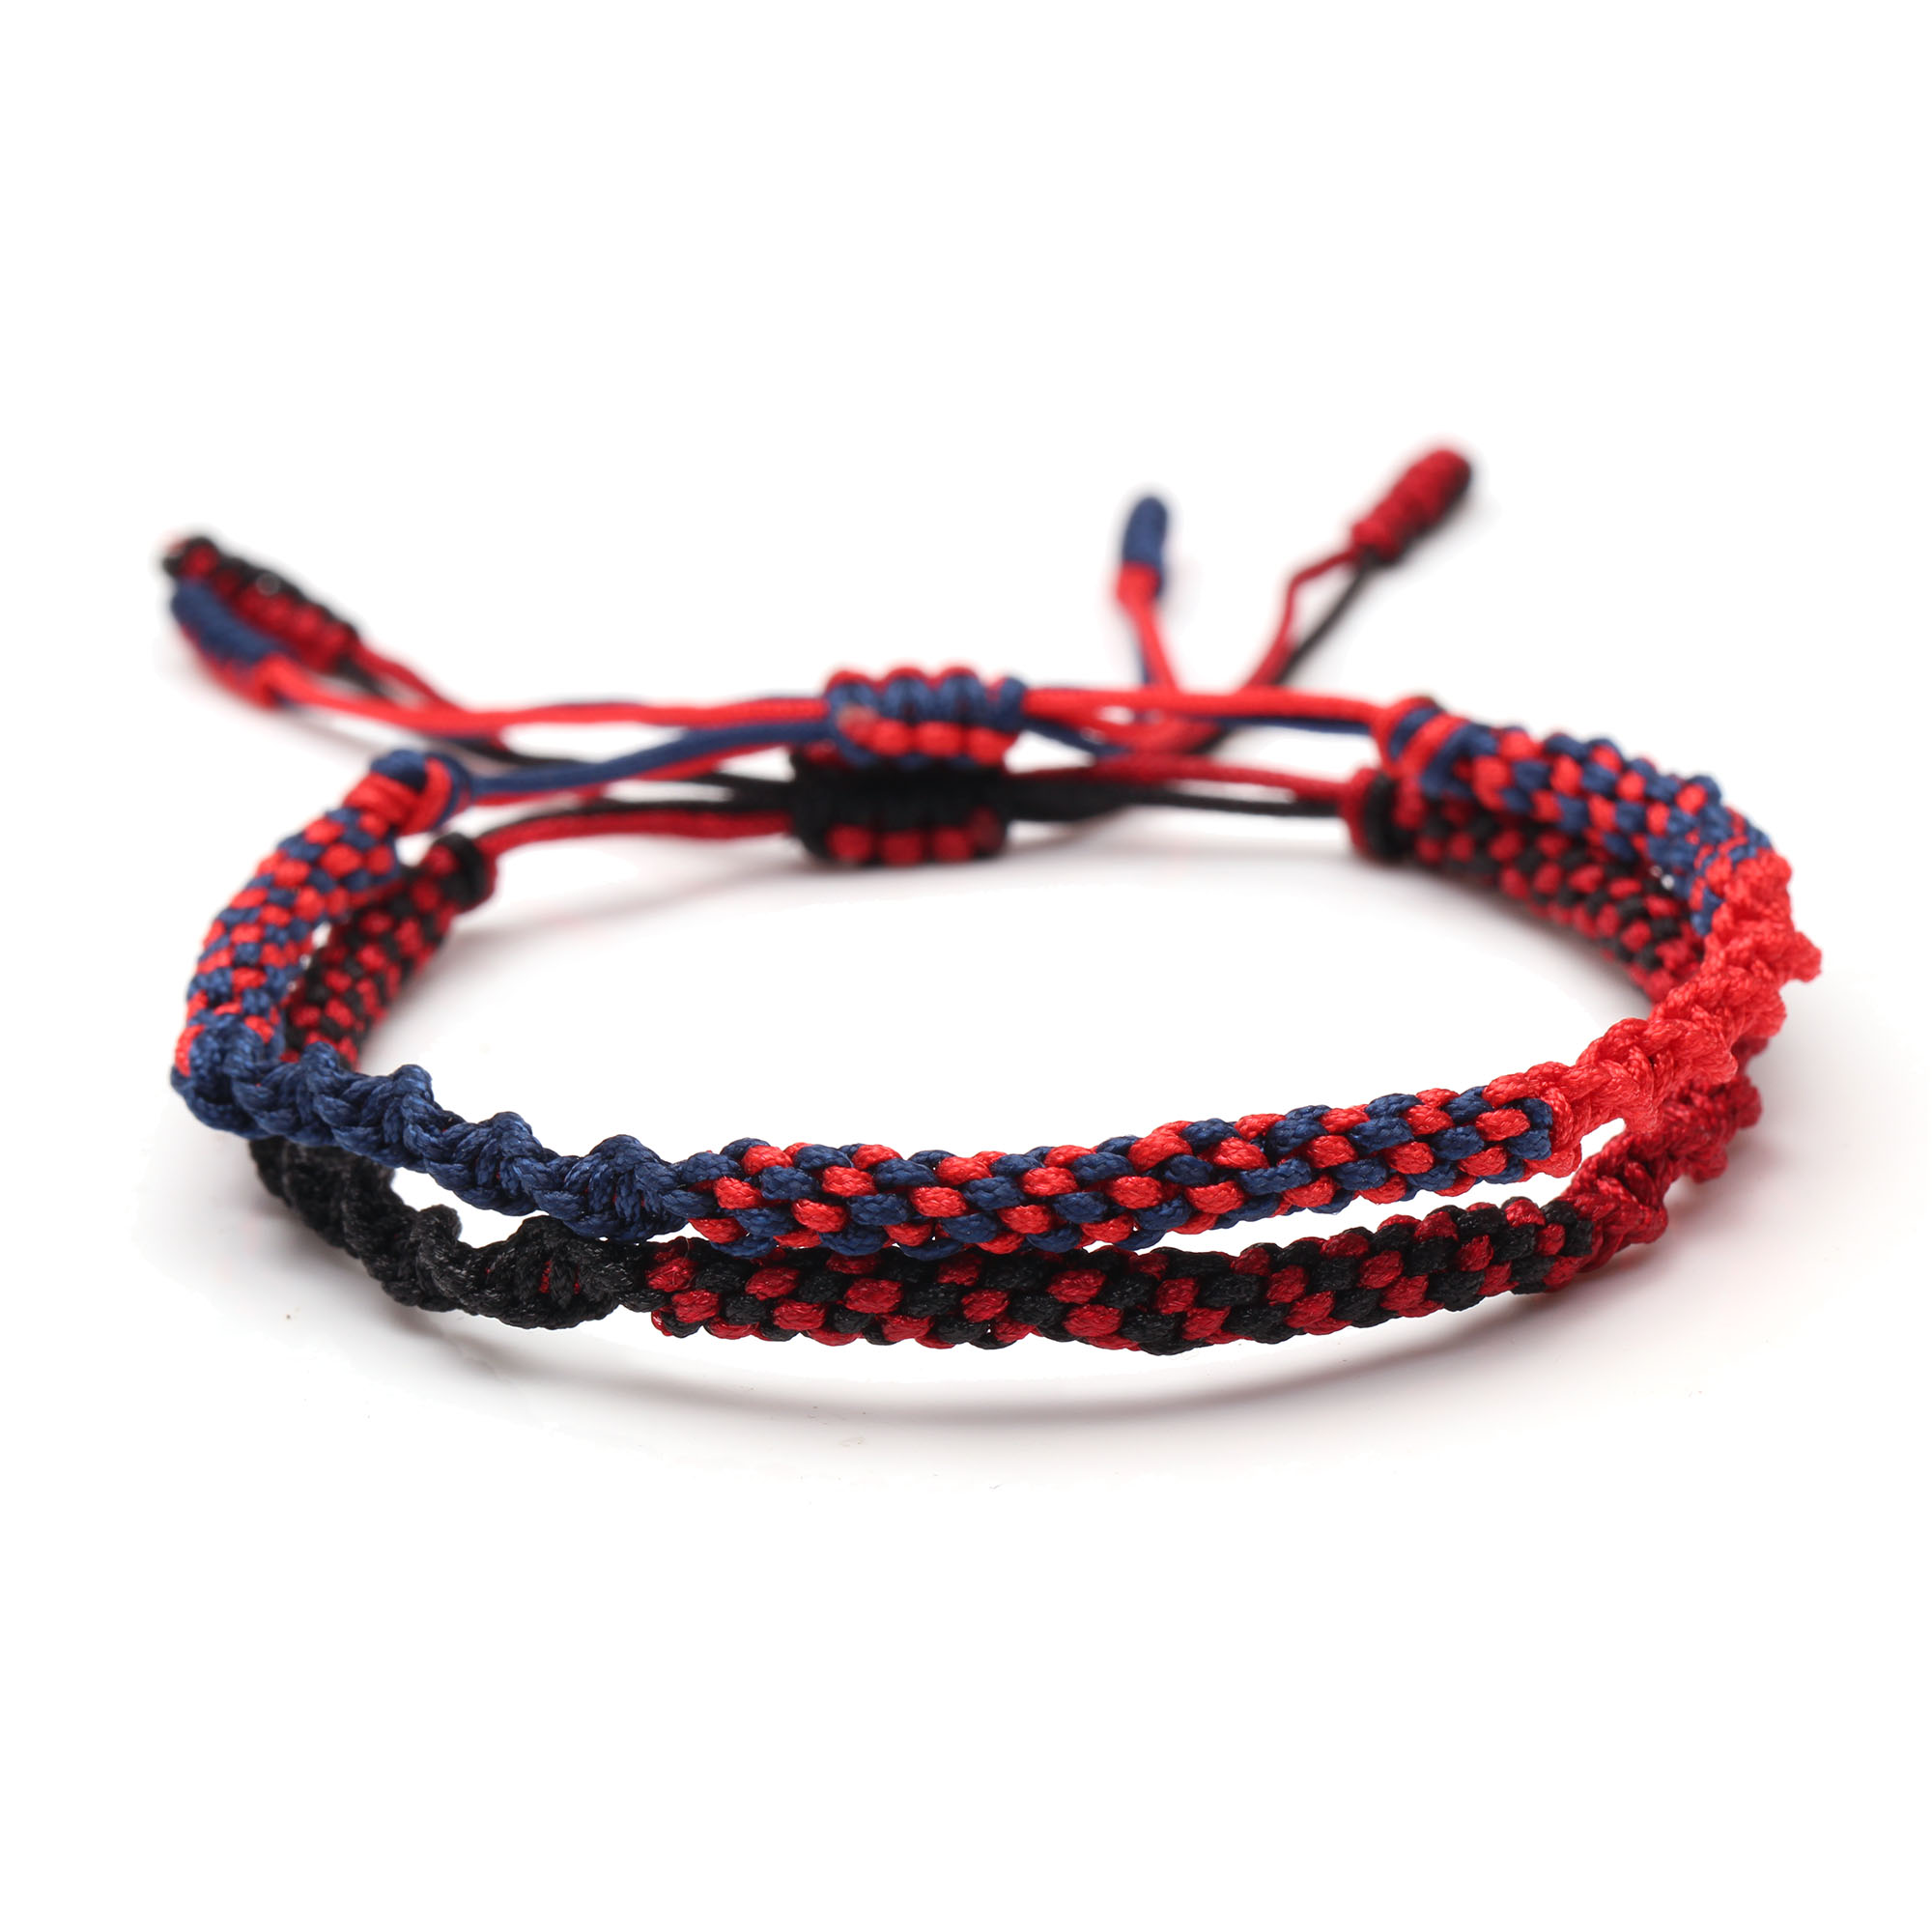 Tibetan Buddhist Lucky Knot Corn Knots Bracelet Women Men 2019 New Fashion Handmade Blue Red Black String Braided Jewelry Gift